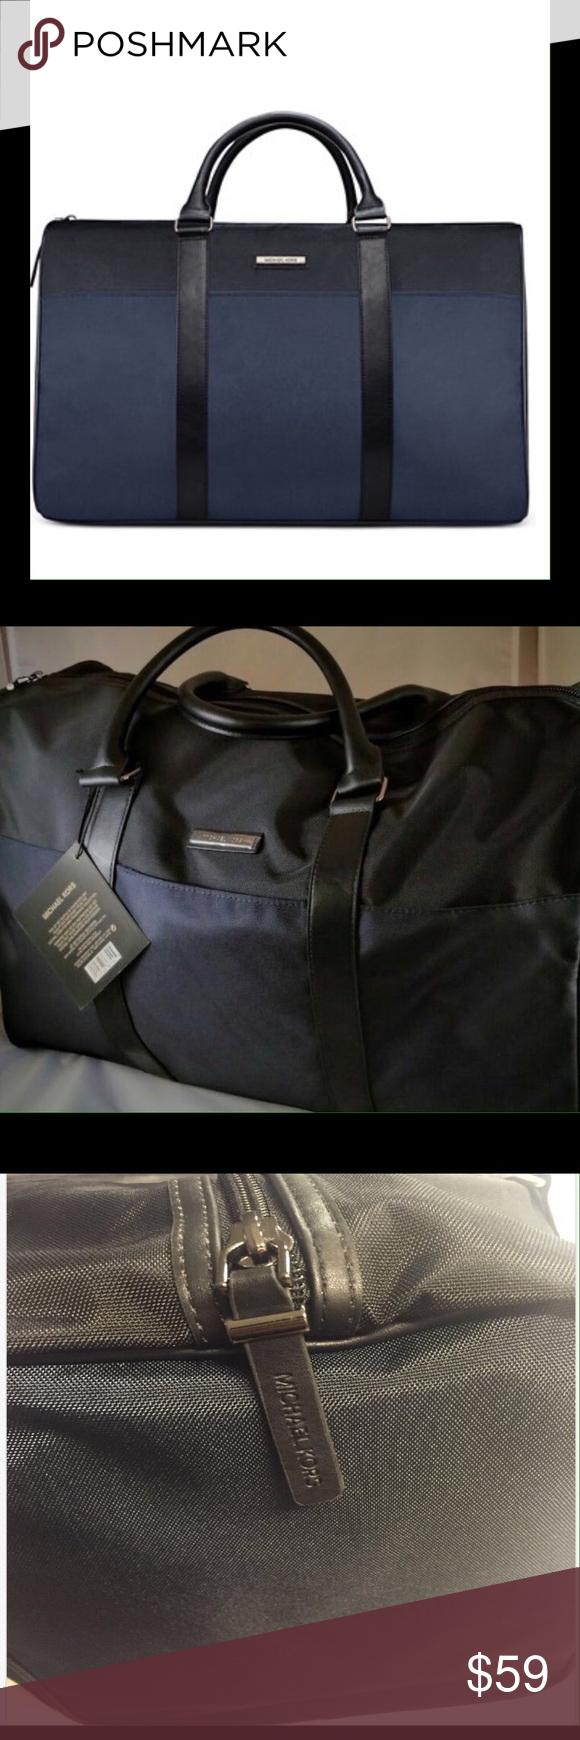 MICHAEL KORS DUFFLE BAG Brand new Michael Kors weekender duffle bag. Features bl…